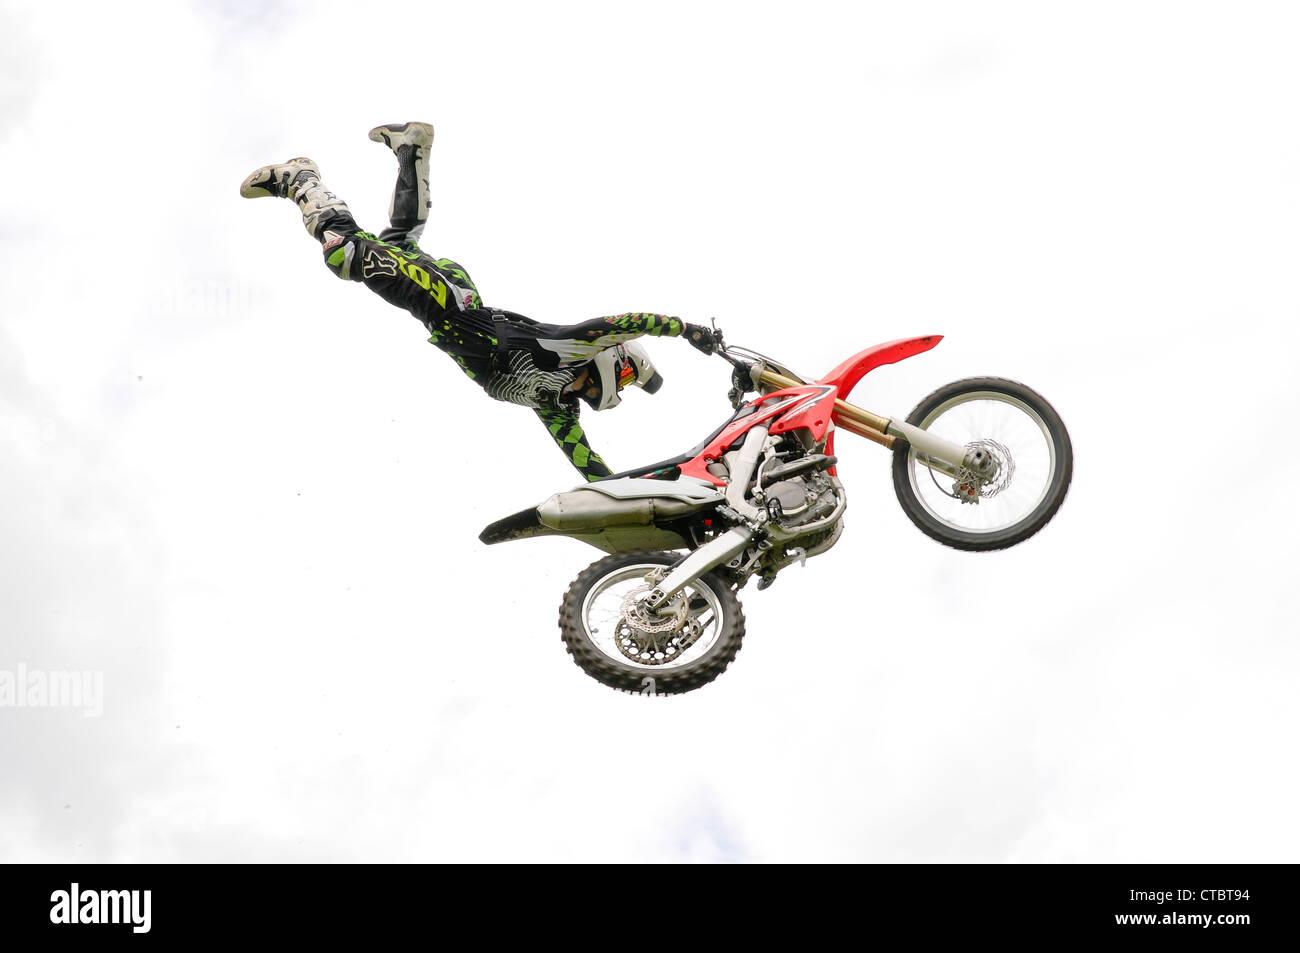 E01175 Freestyle Moto Cross - Stock Image